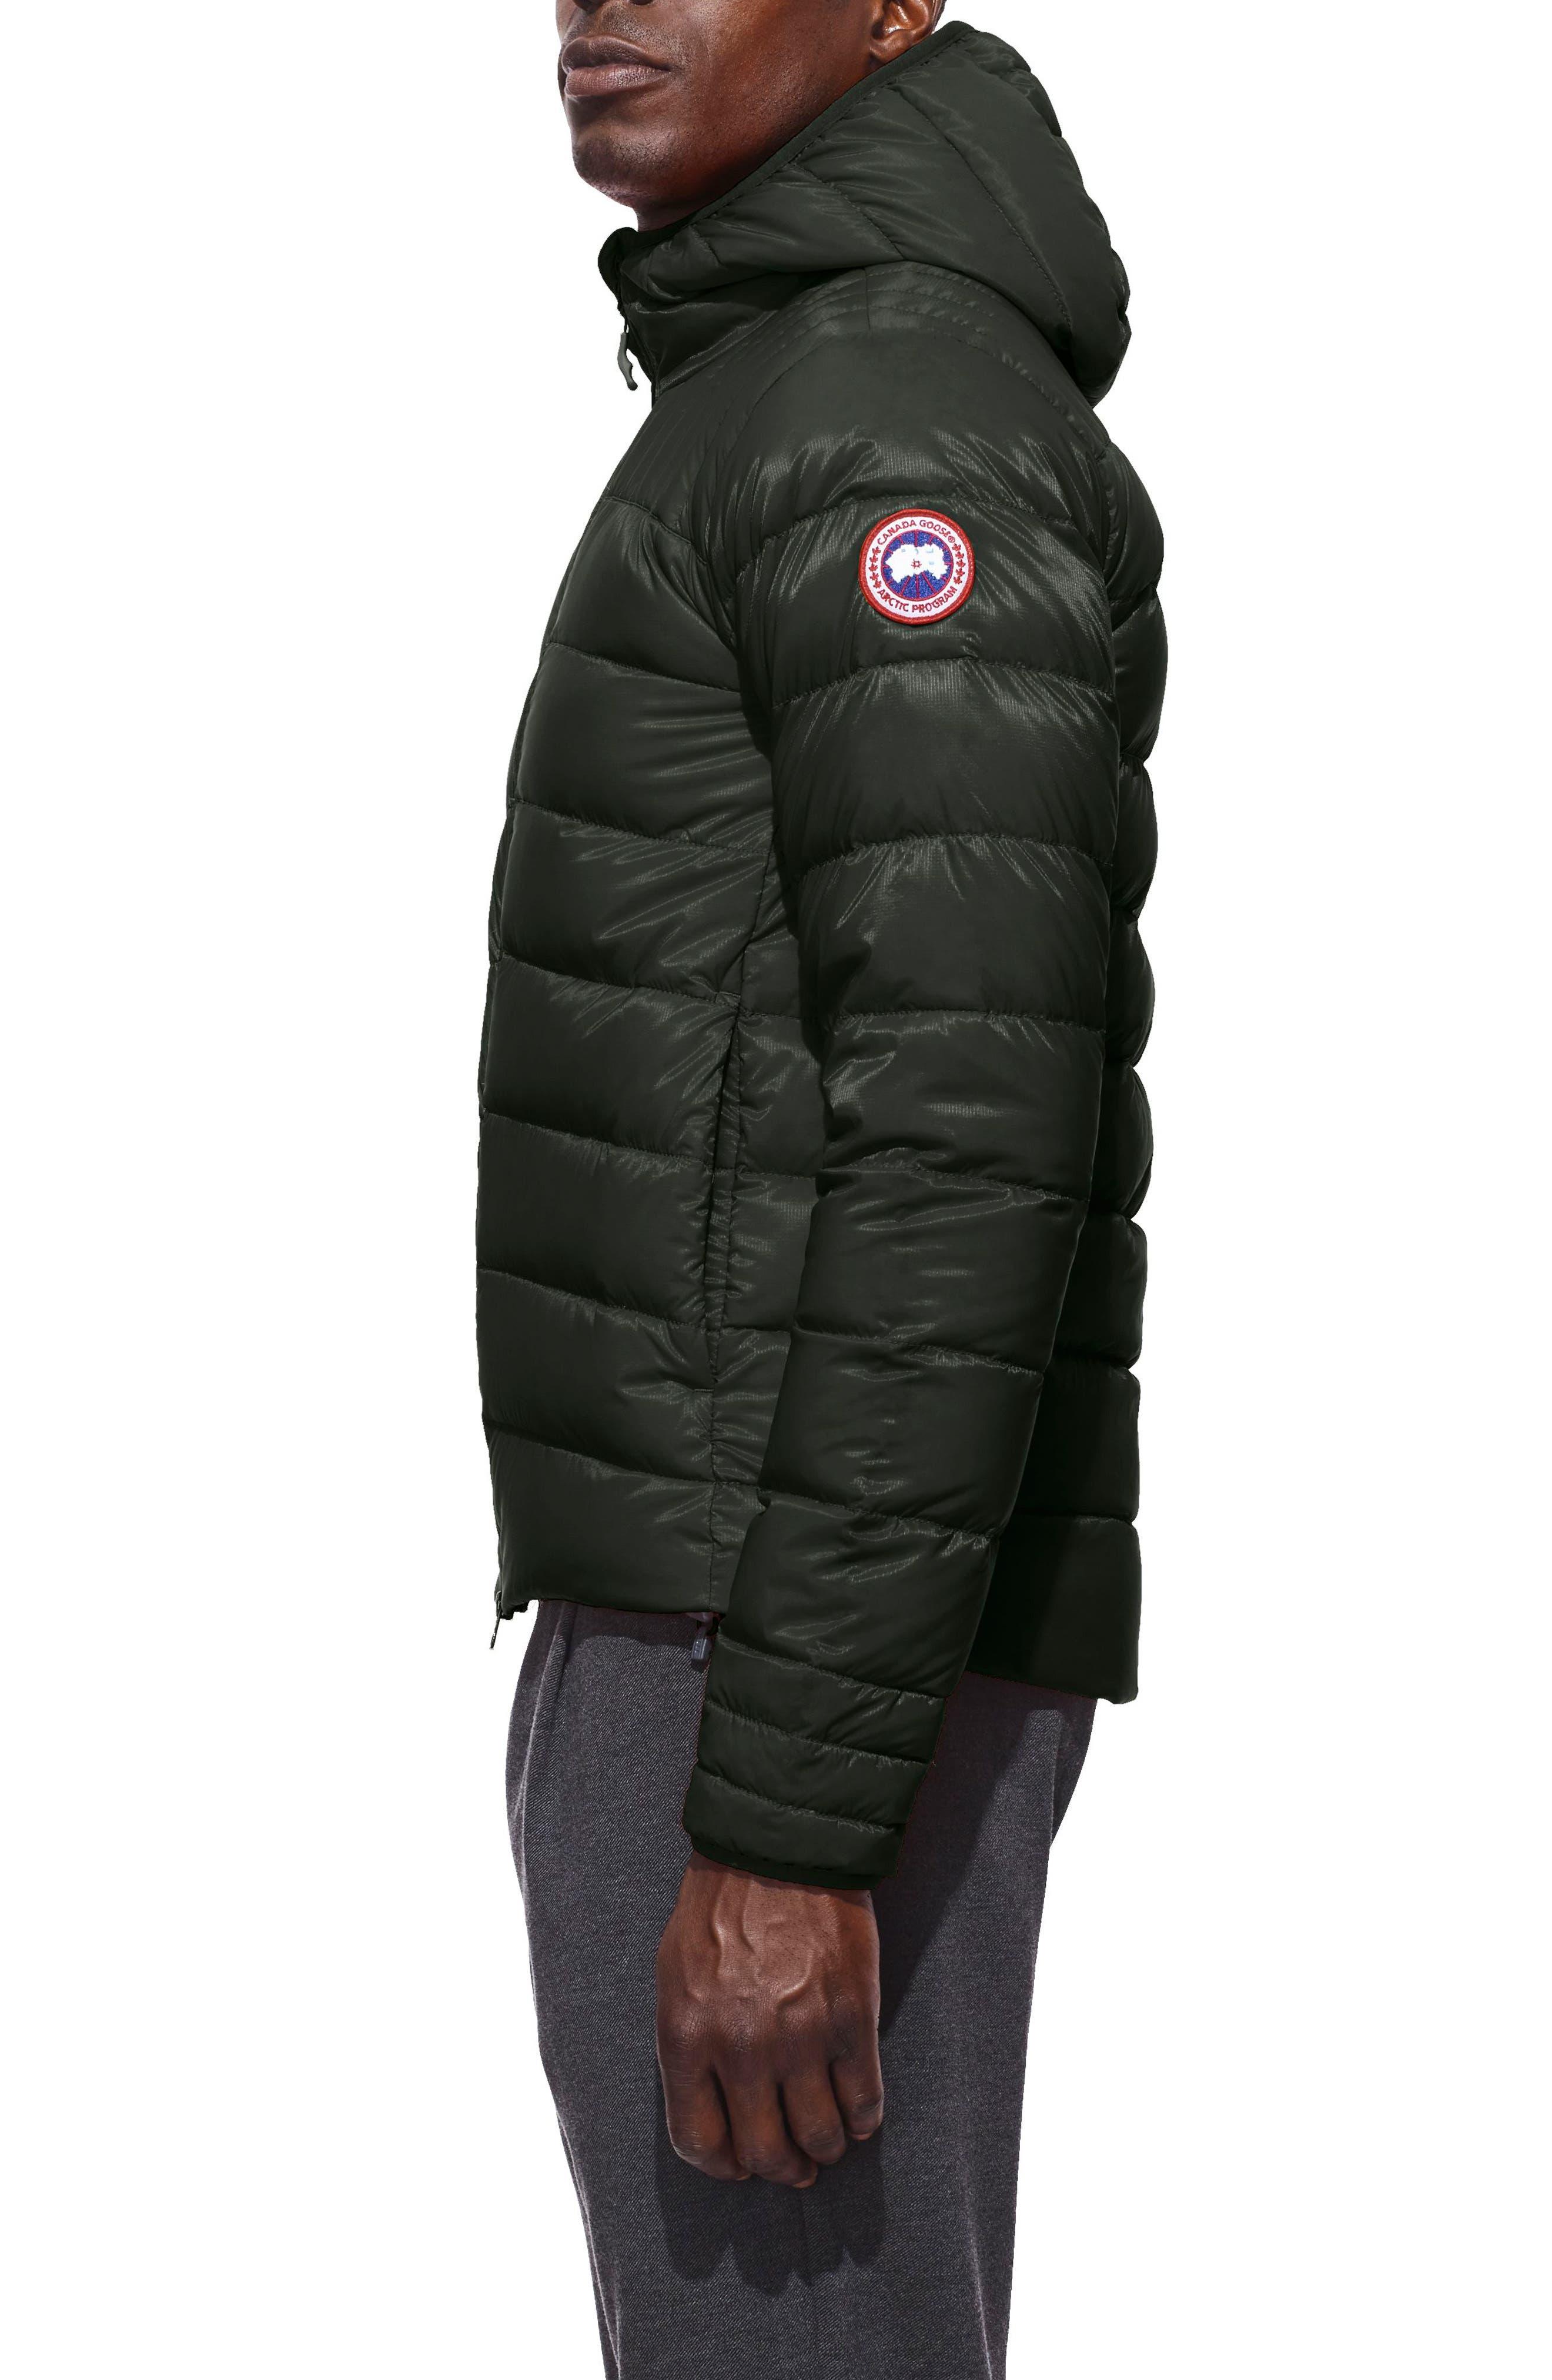 Brookvale Slim Fit Hooded Down Jacket,                             Alternate thumbnail 3, color,                             VOLCANO/ BLACK